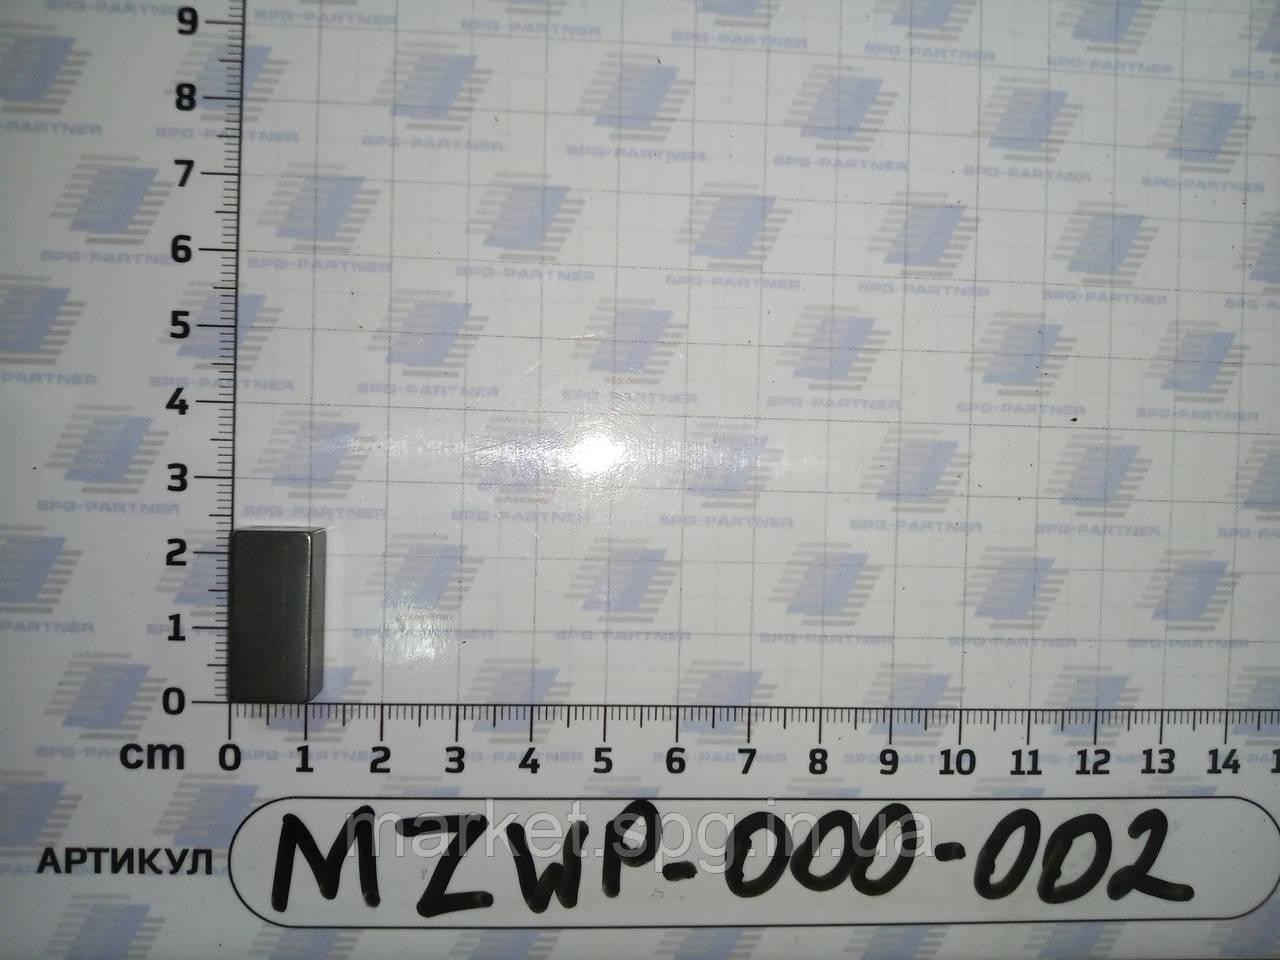 MZWP-000-002 призматична Шпонка 10х8х22 В SaMASZ